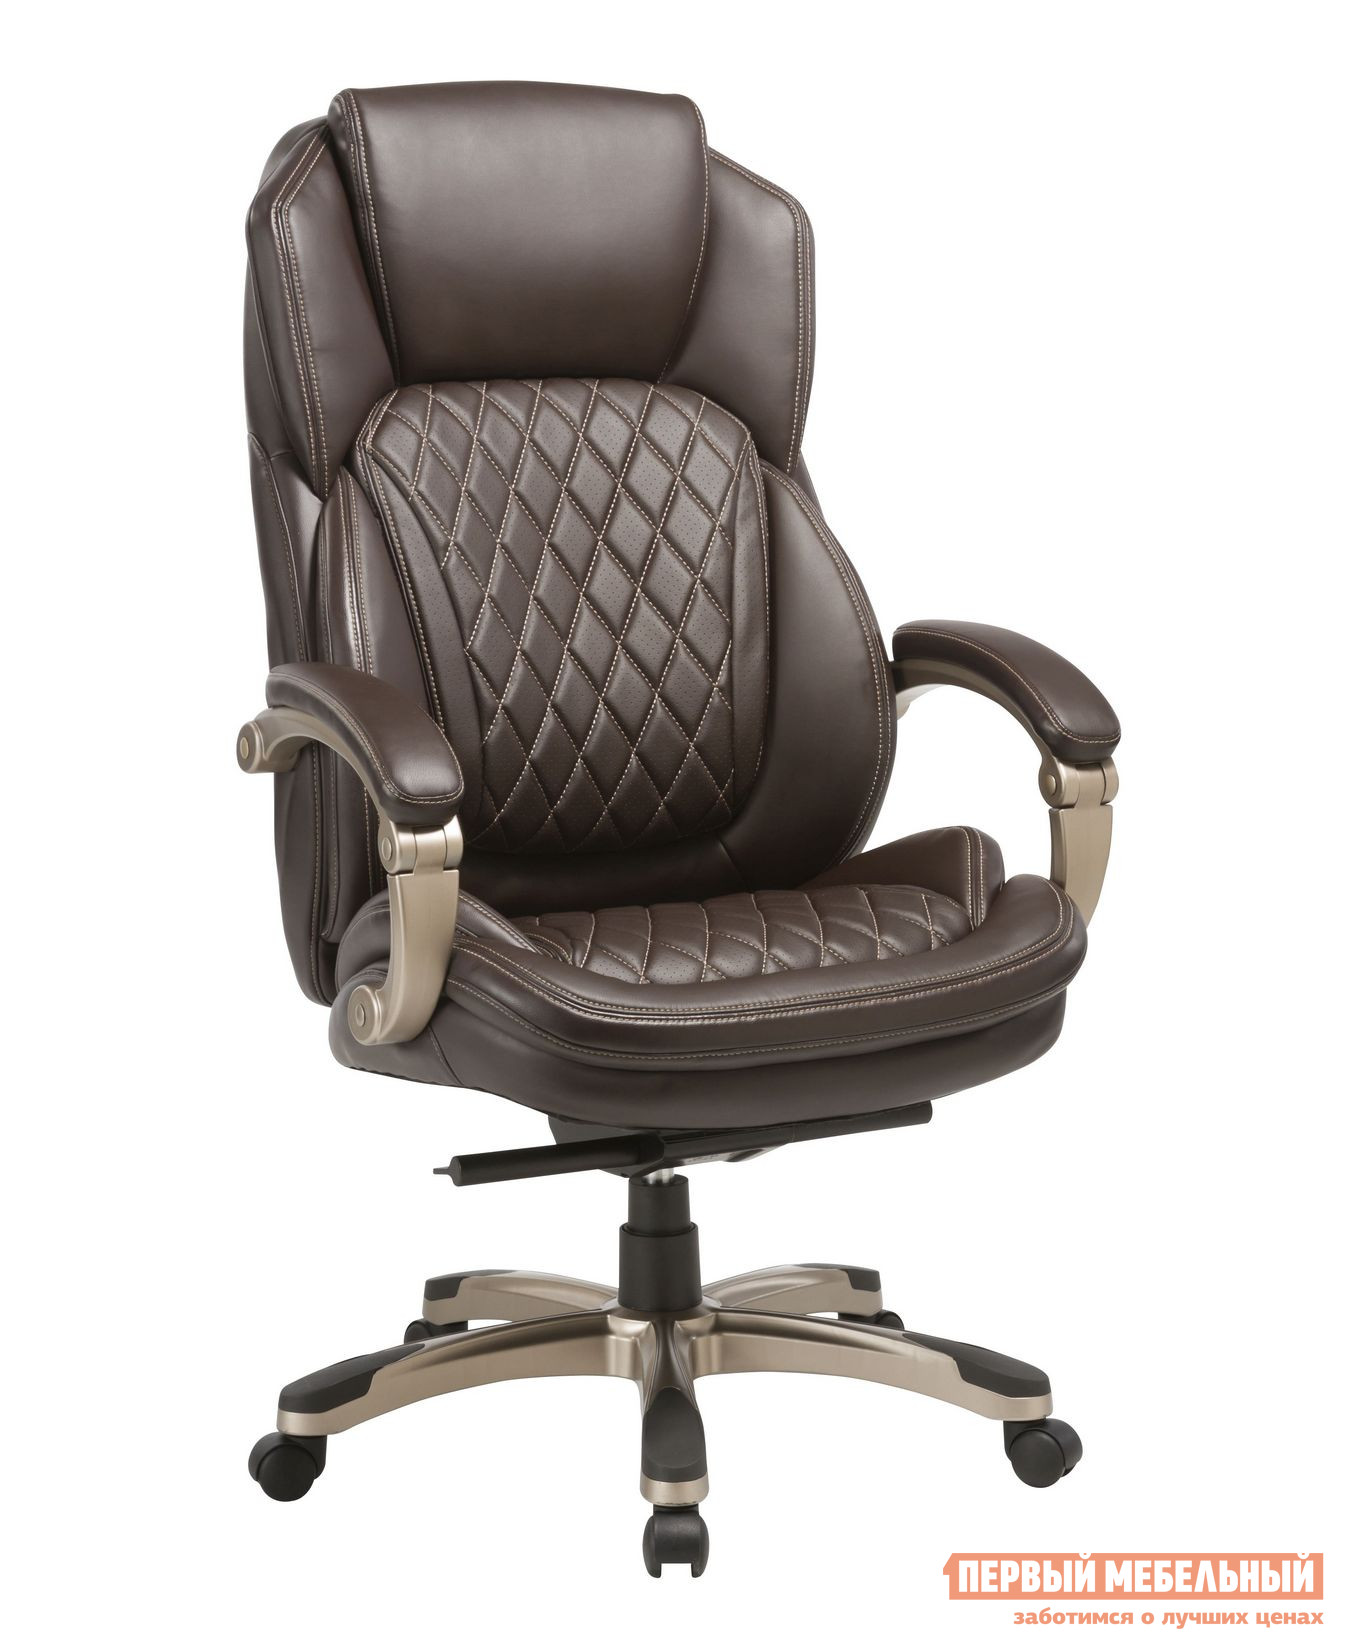 Кресло руководителя Бюрократ T-9915 утюг 9915